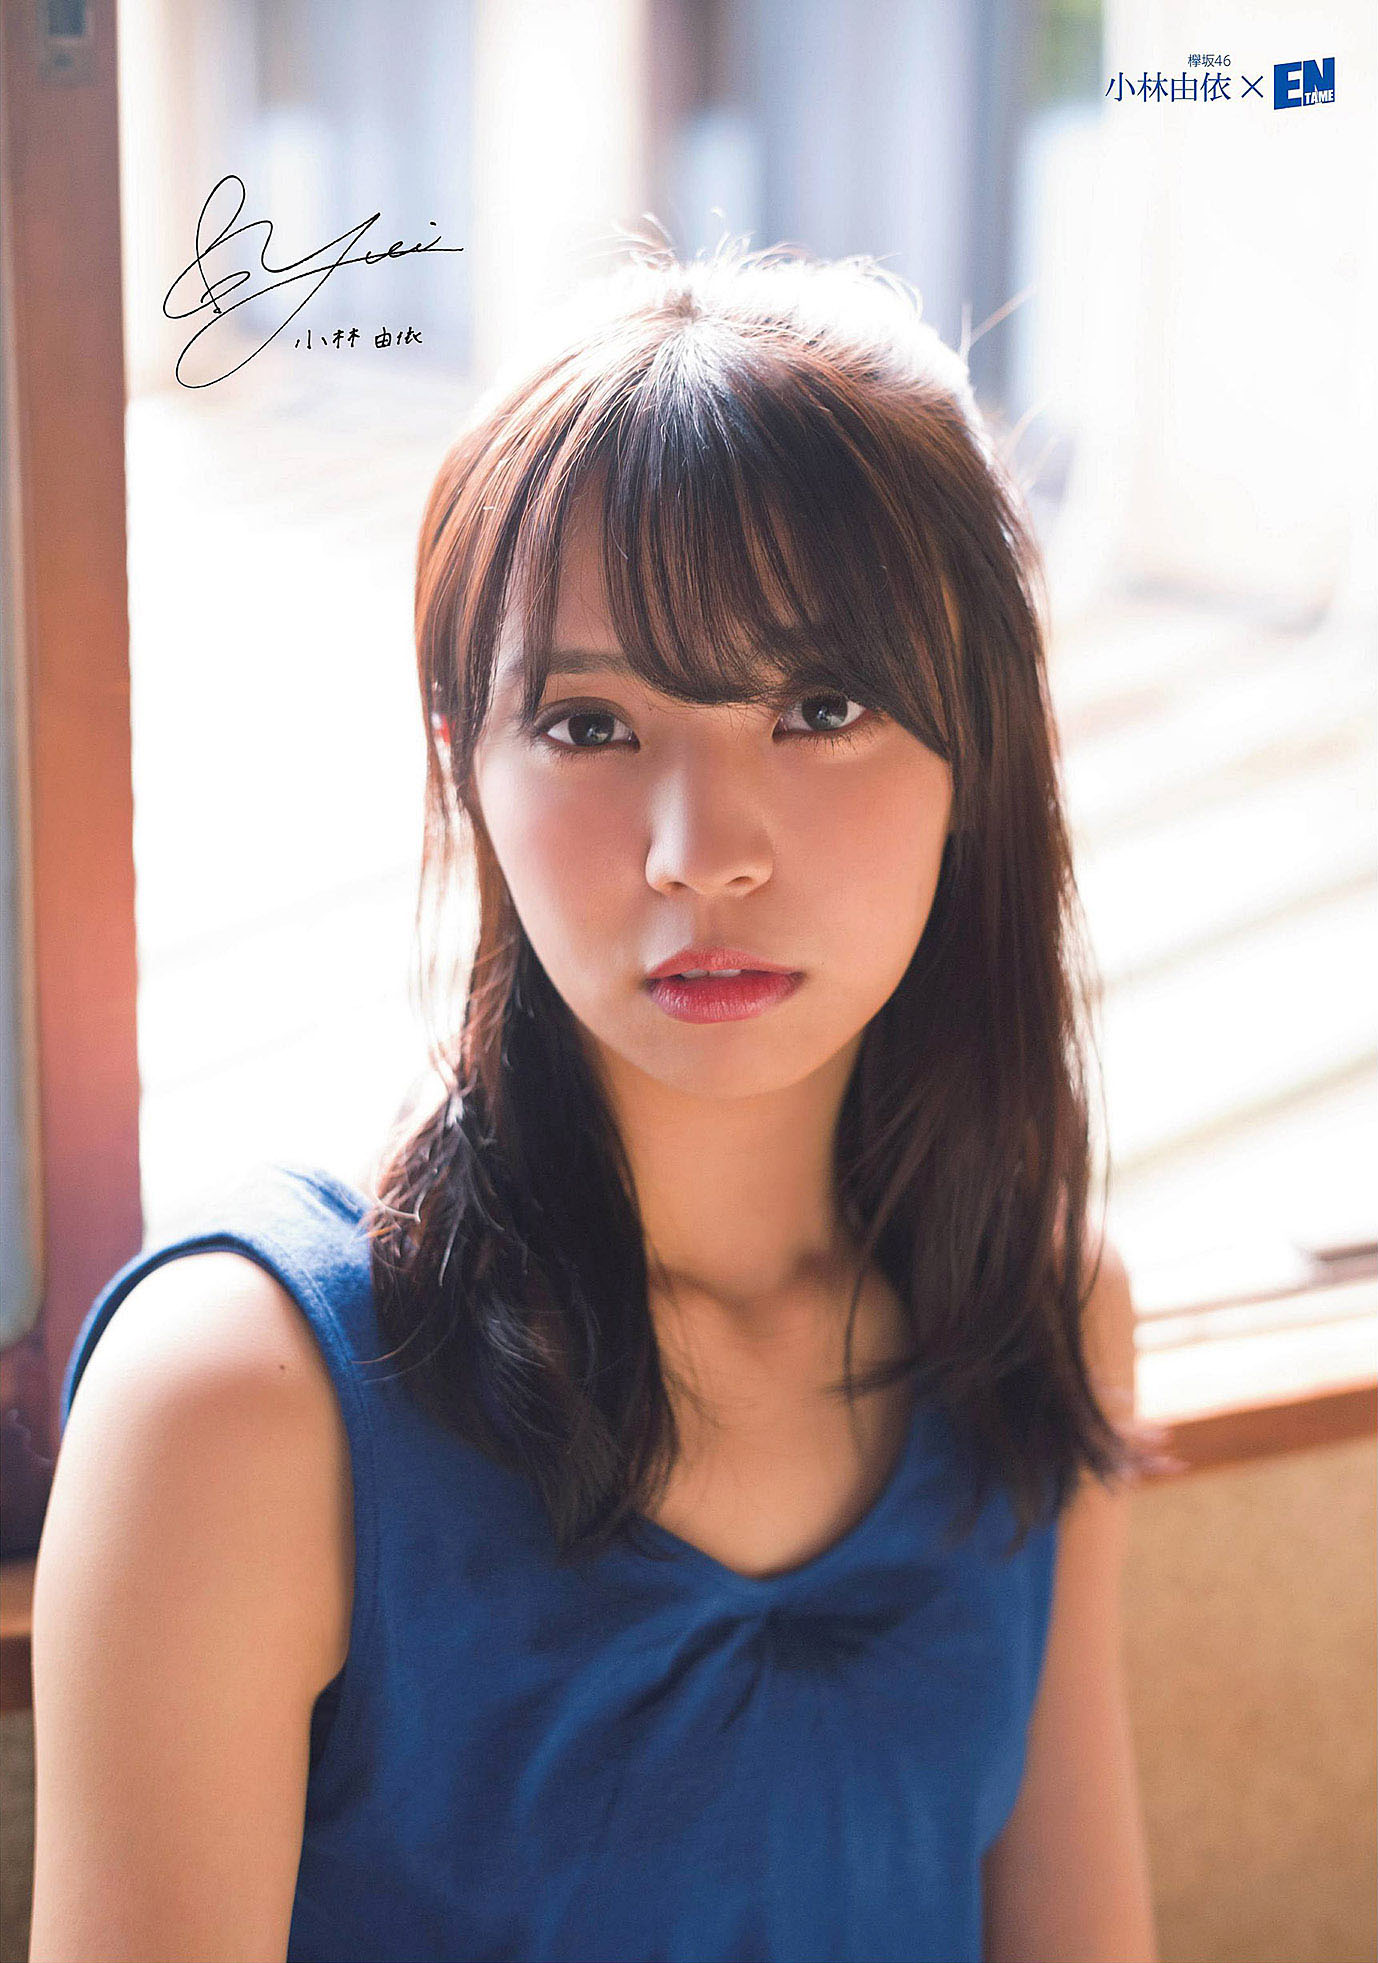 YKobayashi RMatsuda K46 EnTame 2001 14.jpg